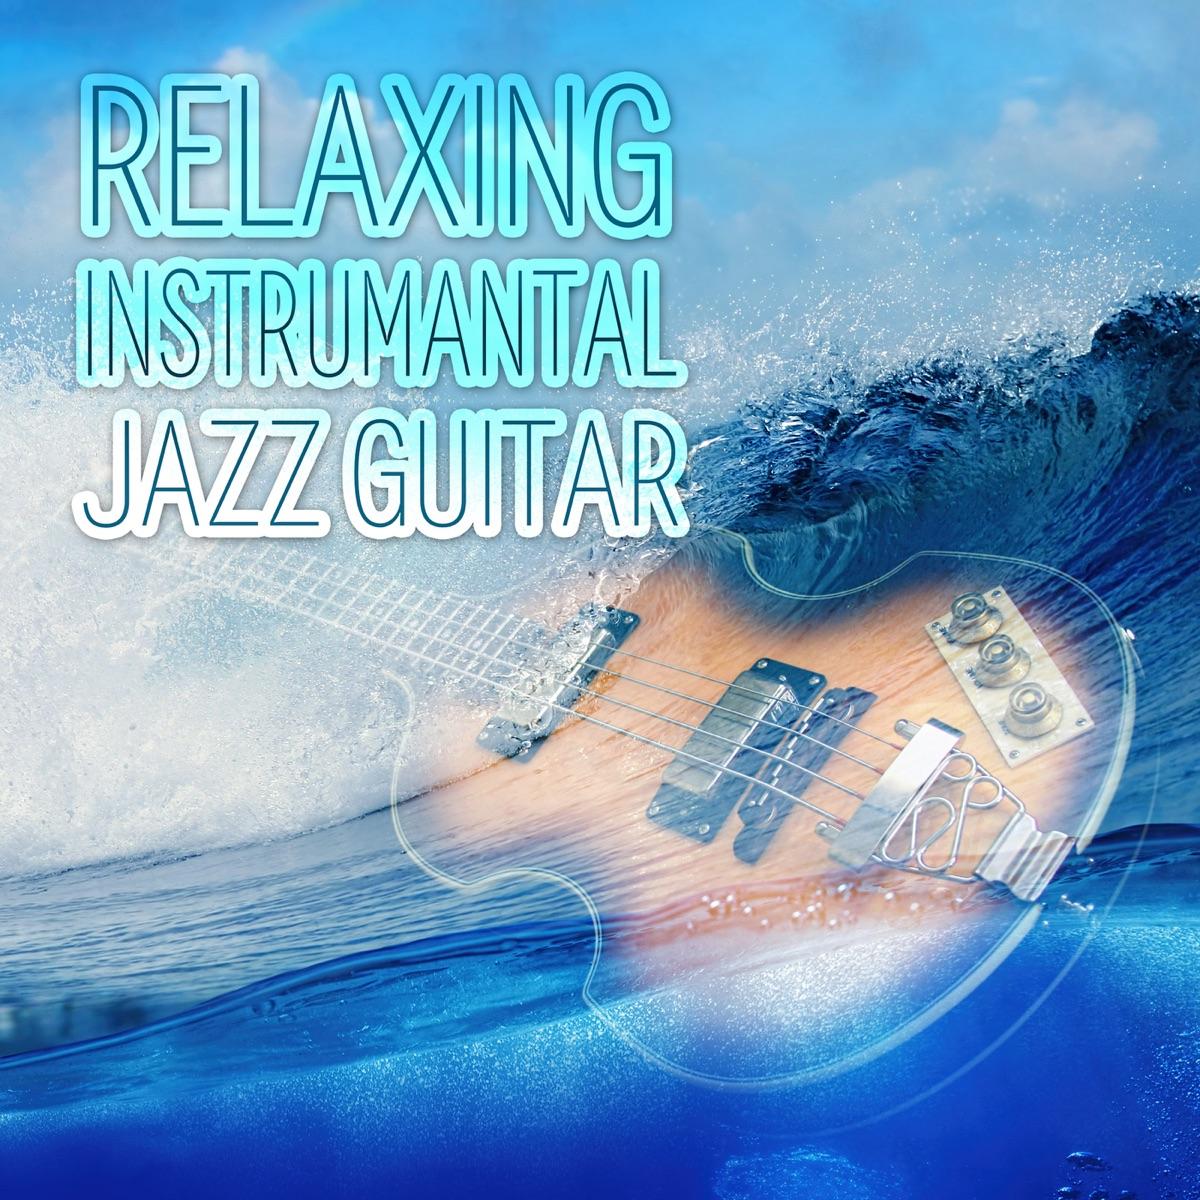 Relaxing Instrumental Jazz Guitar - Chill Music, Romantic